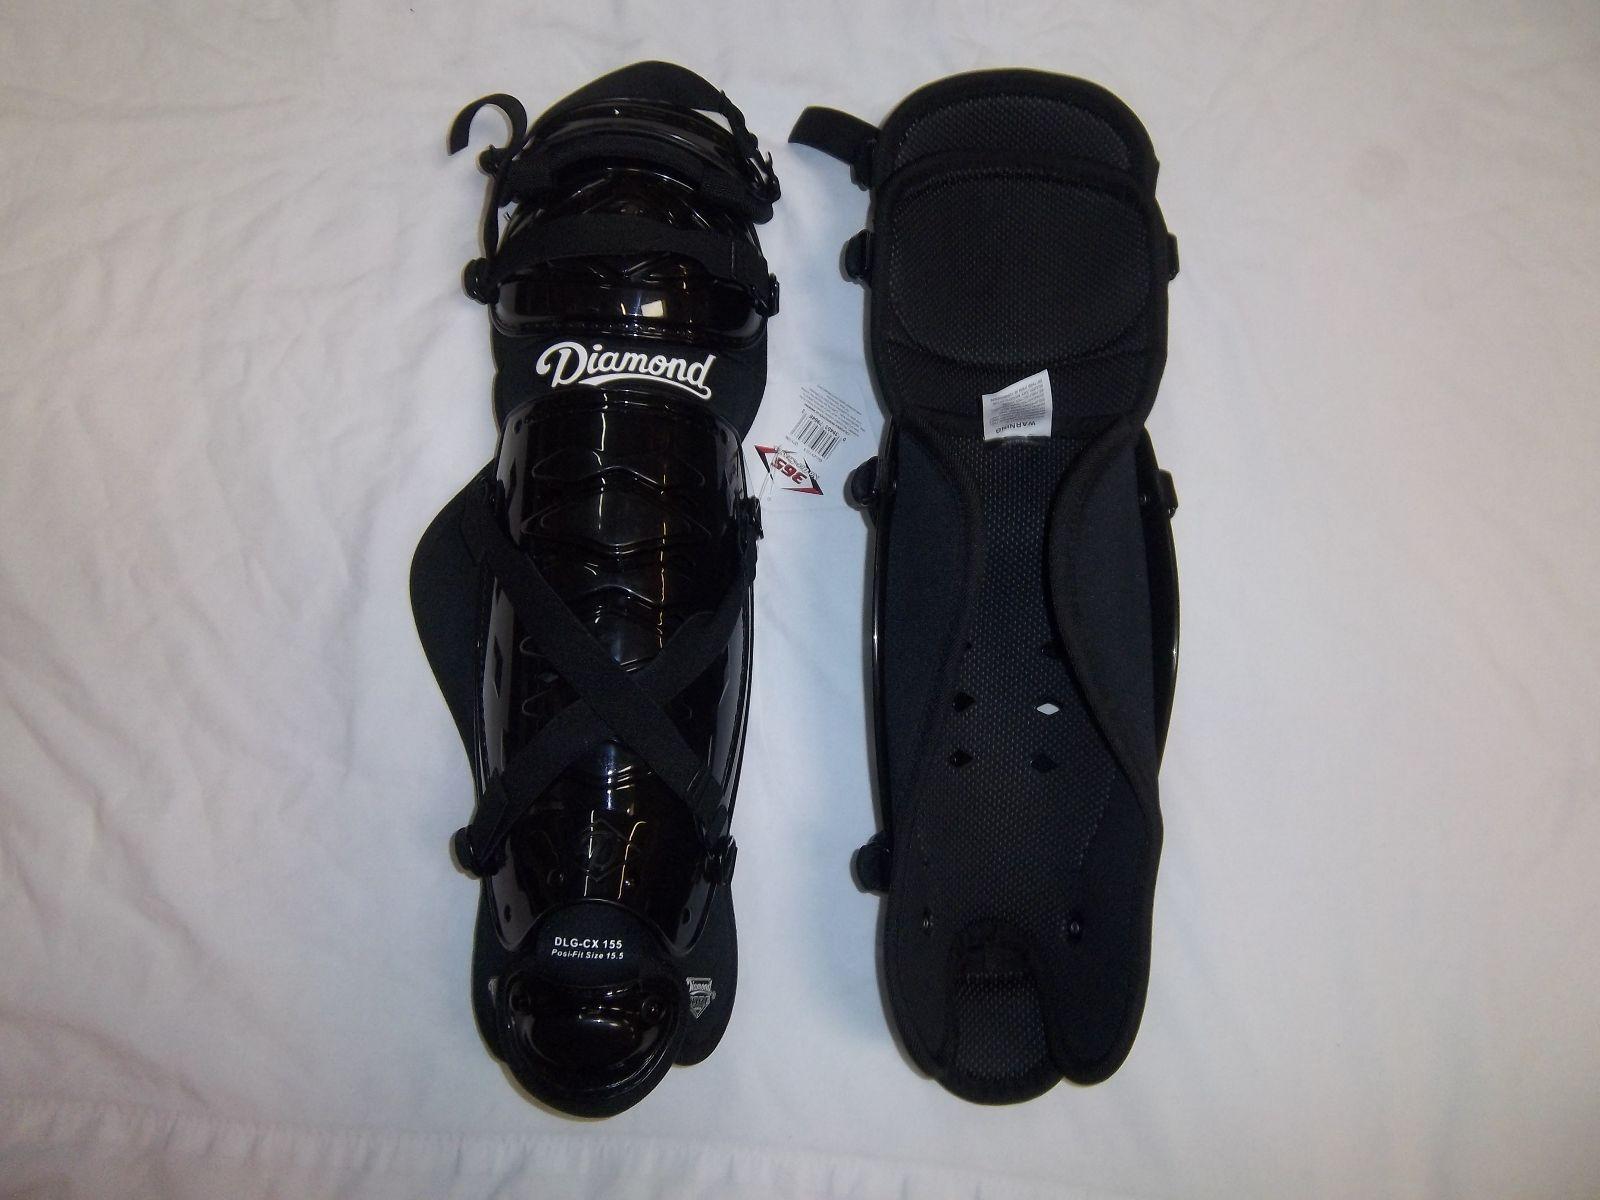 DIAMOND DLG-CX 165 BASEBALL SOFTBALL CATCHERS  LEG GUARD (VARIOUS COLORS)